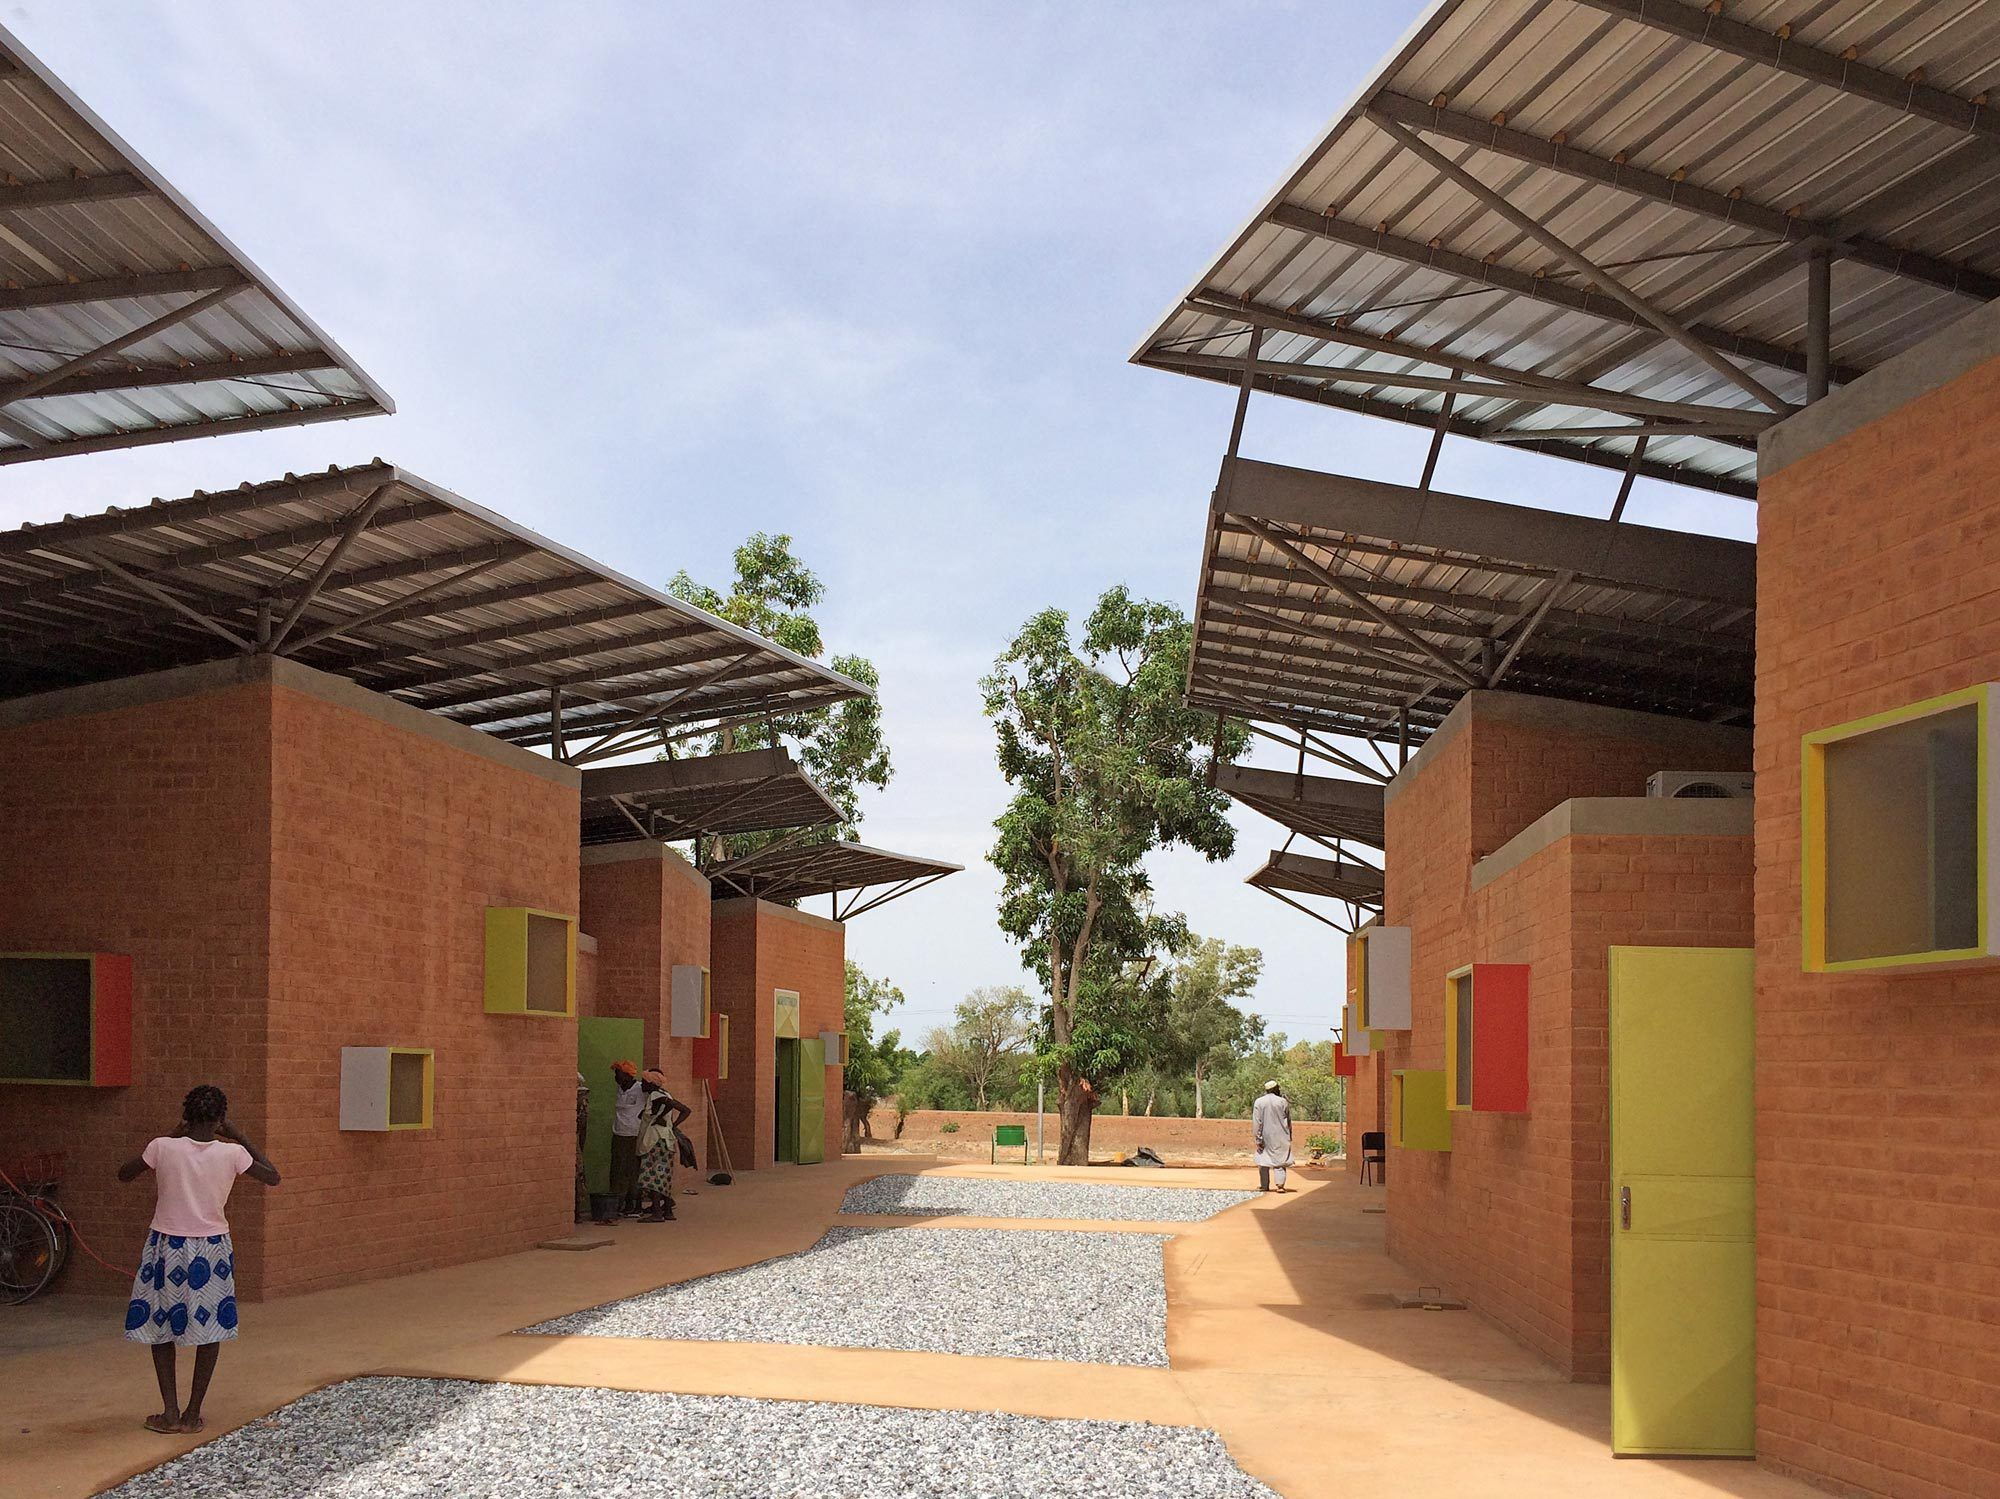 Operieren in Afrika - Klinik von Francis Kere in Burkina Faso ... on